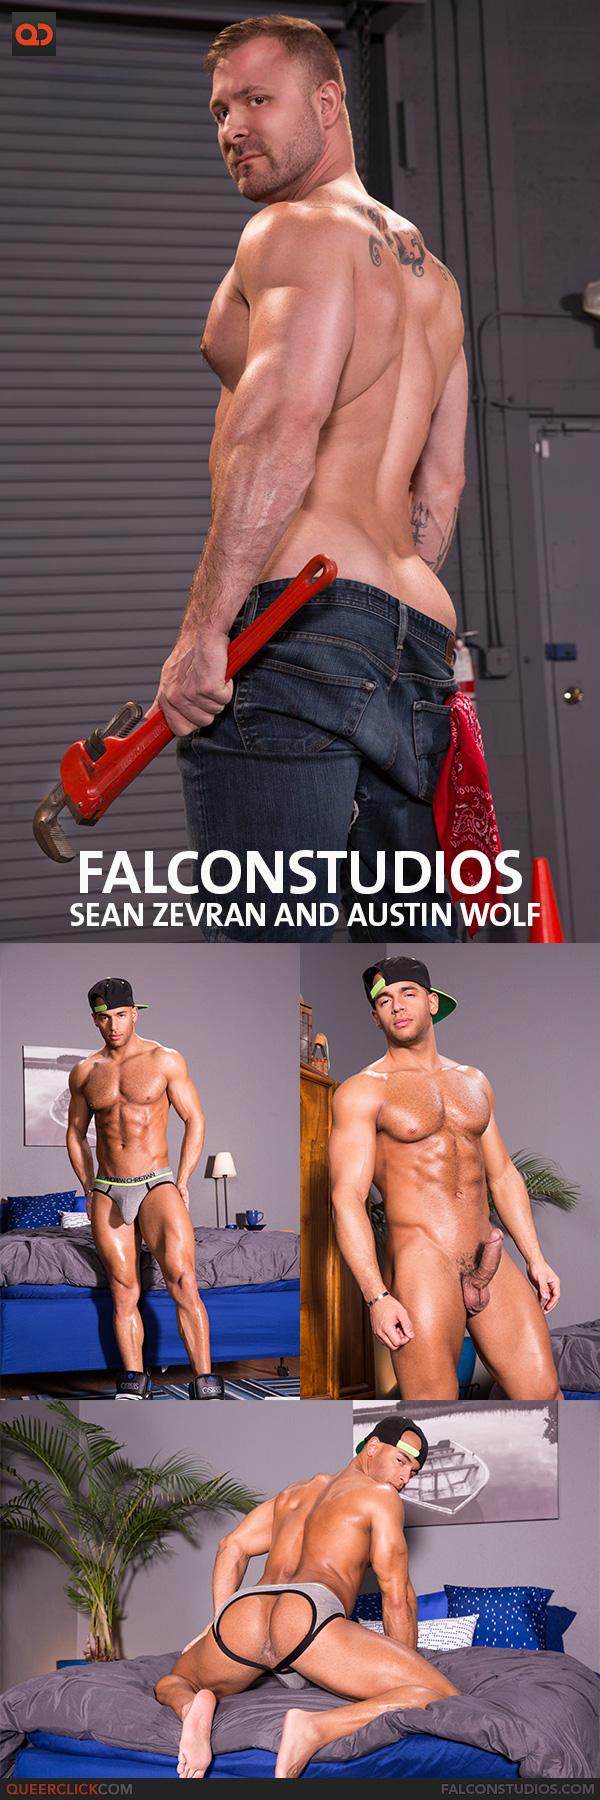 Falcon Studios: Sean Zevran and Austin Wolf